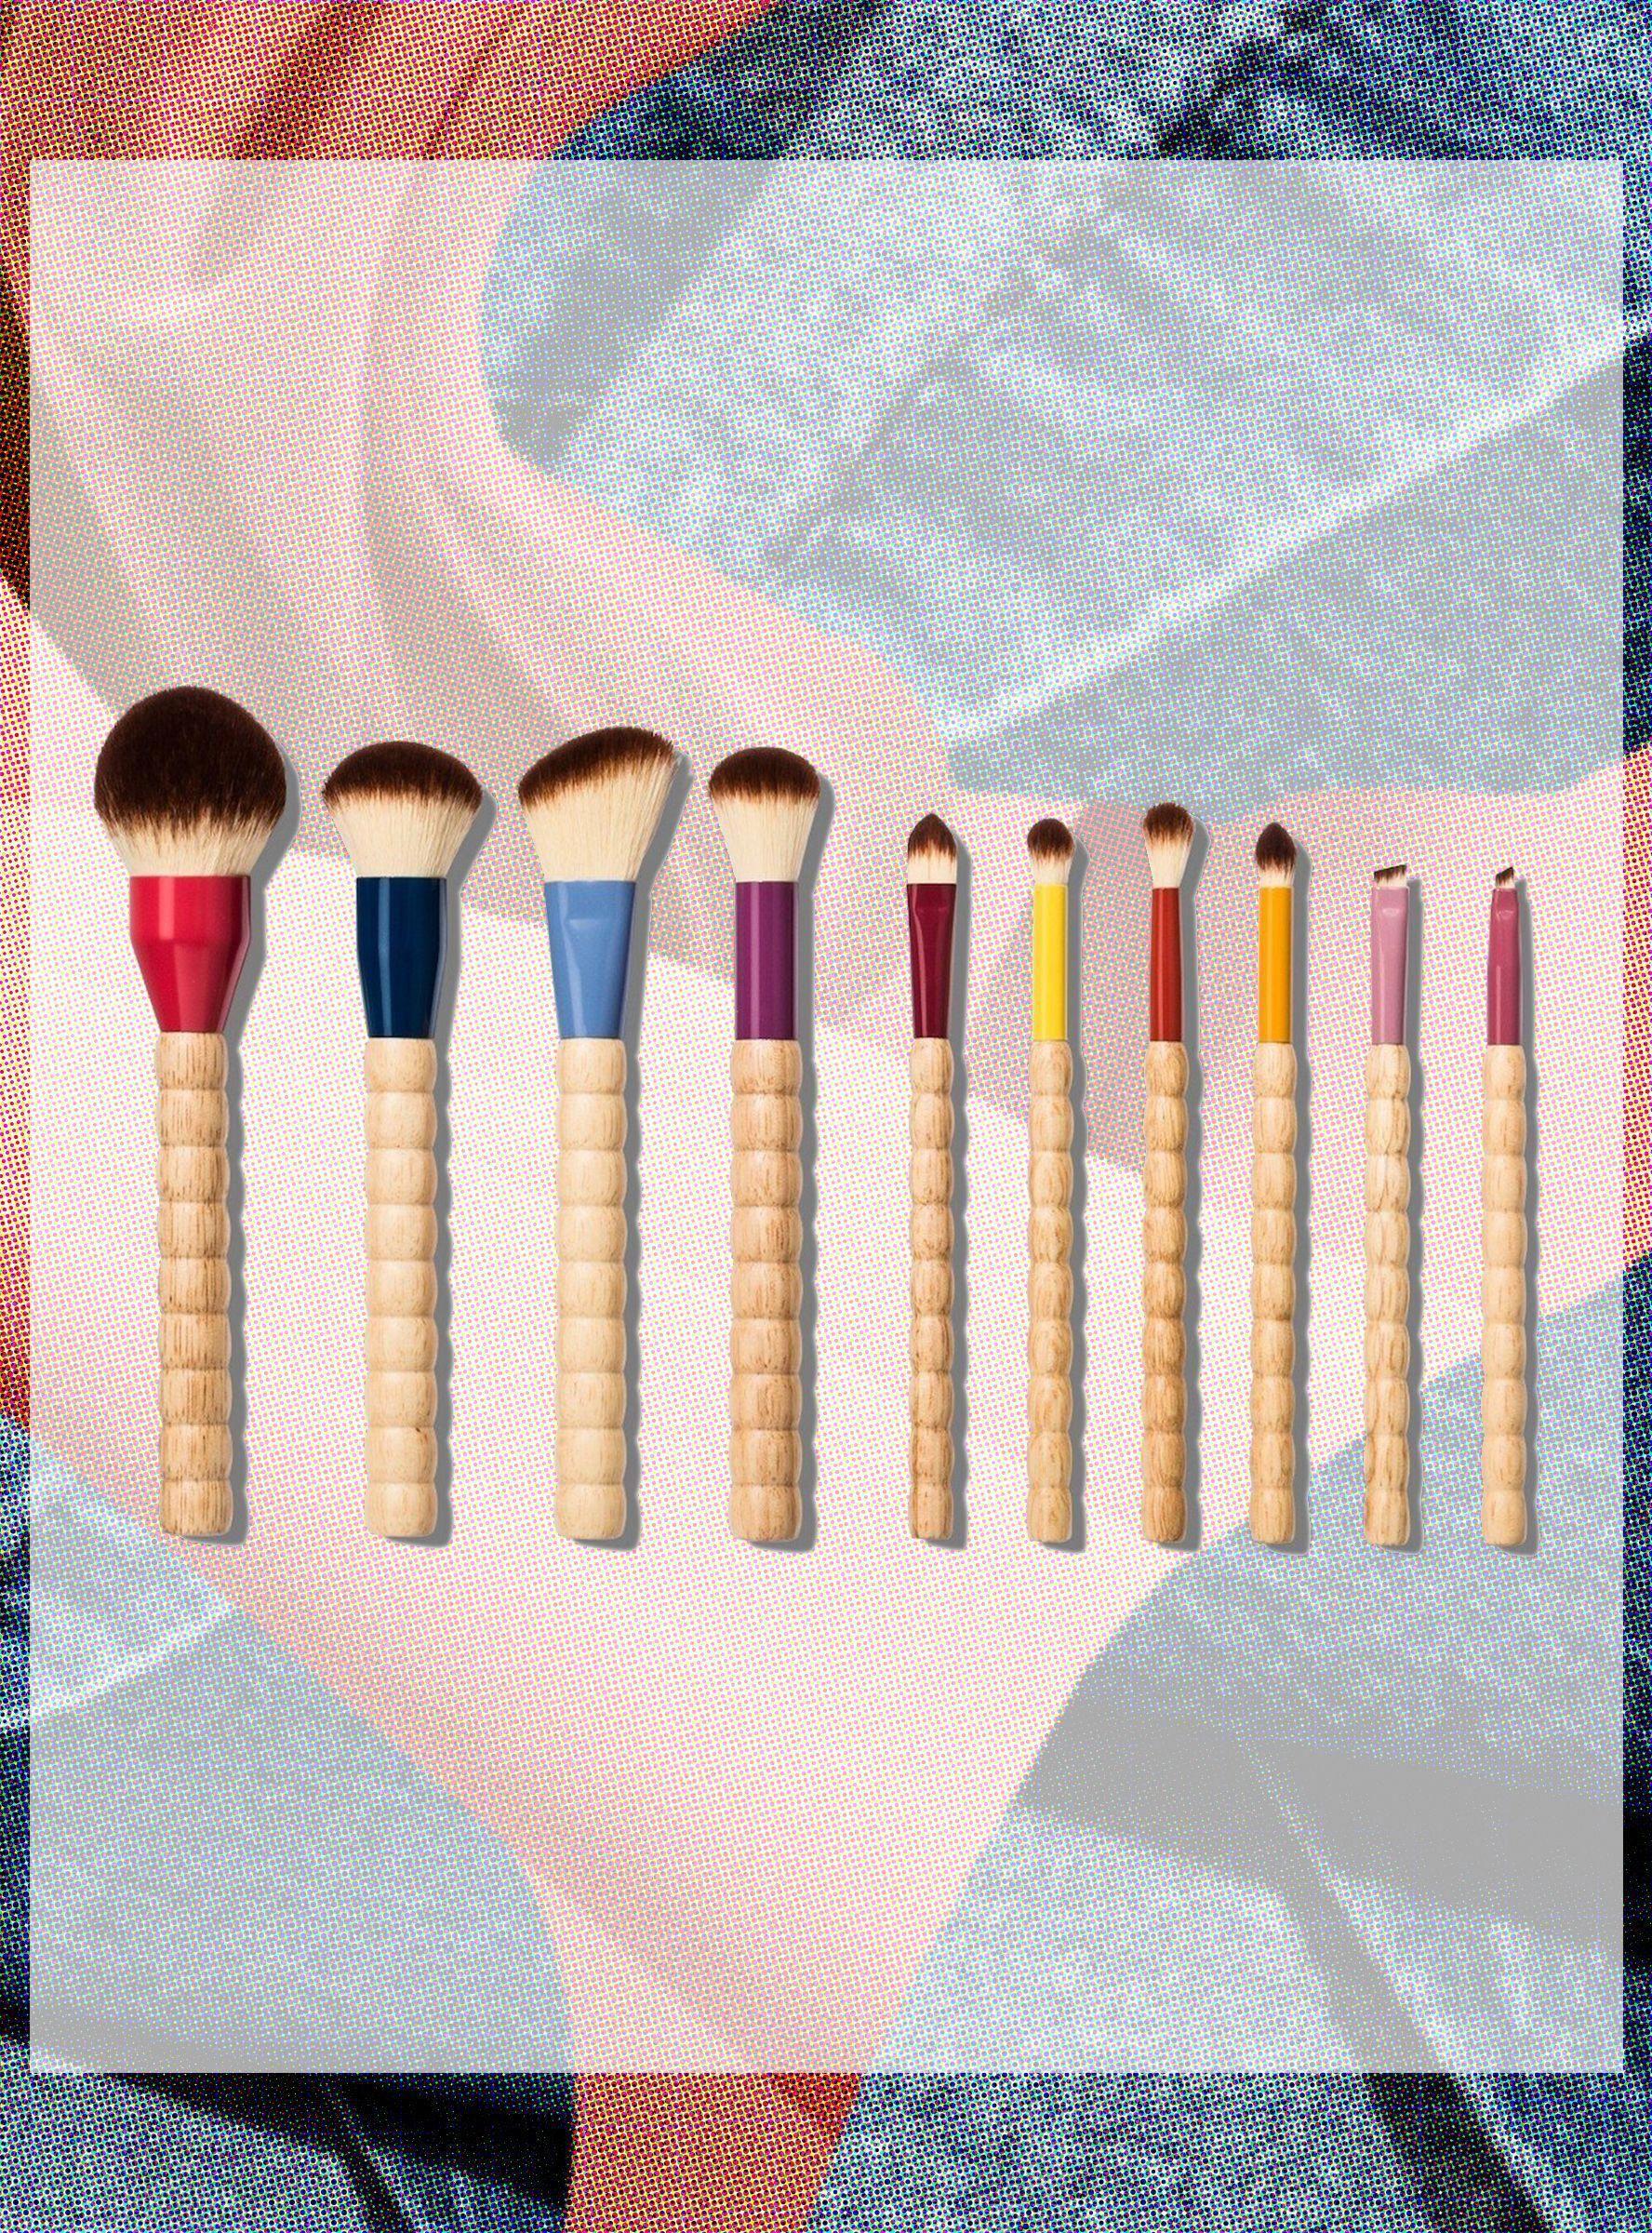 Adore this.. makeupbrushes Cheap makeup brushes set